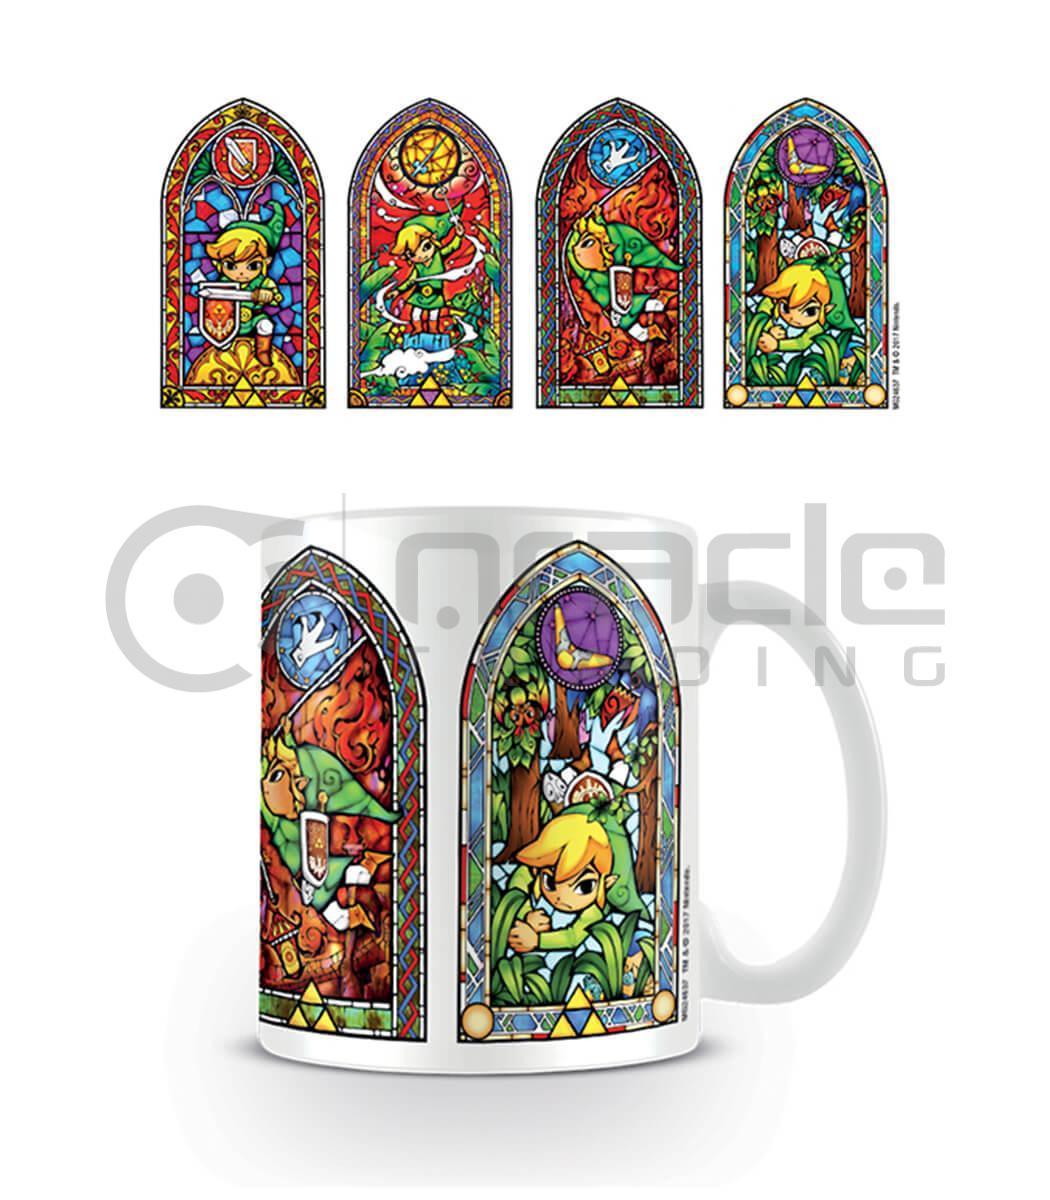 Zelda Mug - Stained Glass